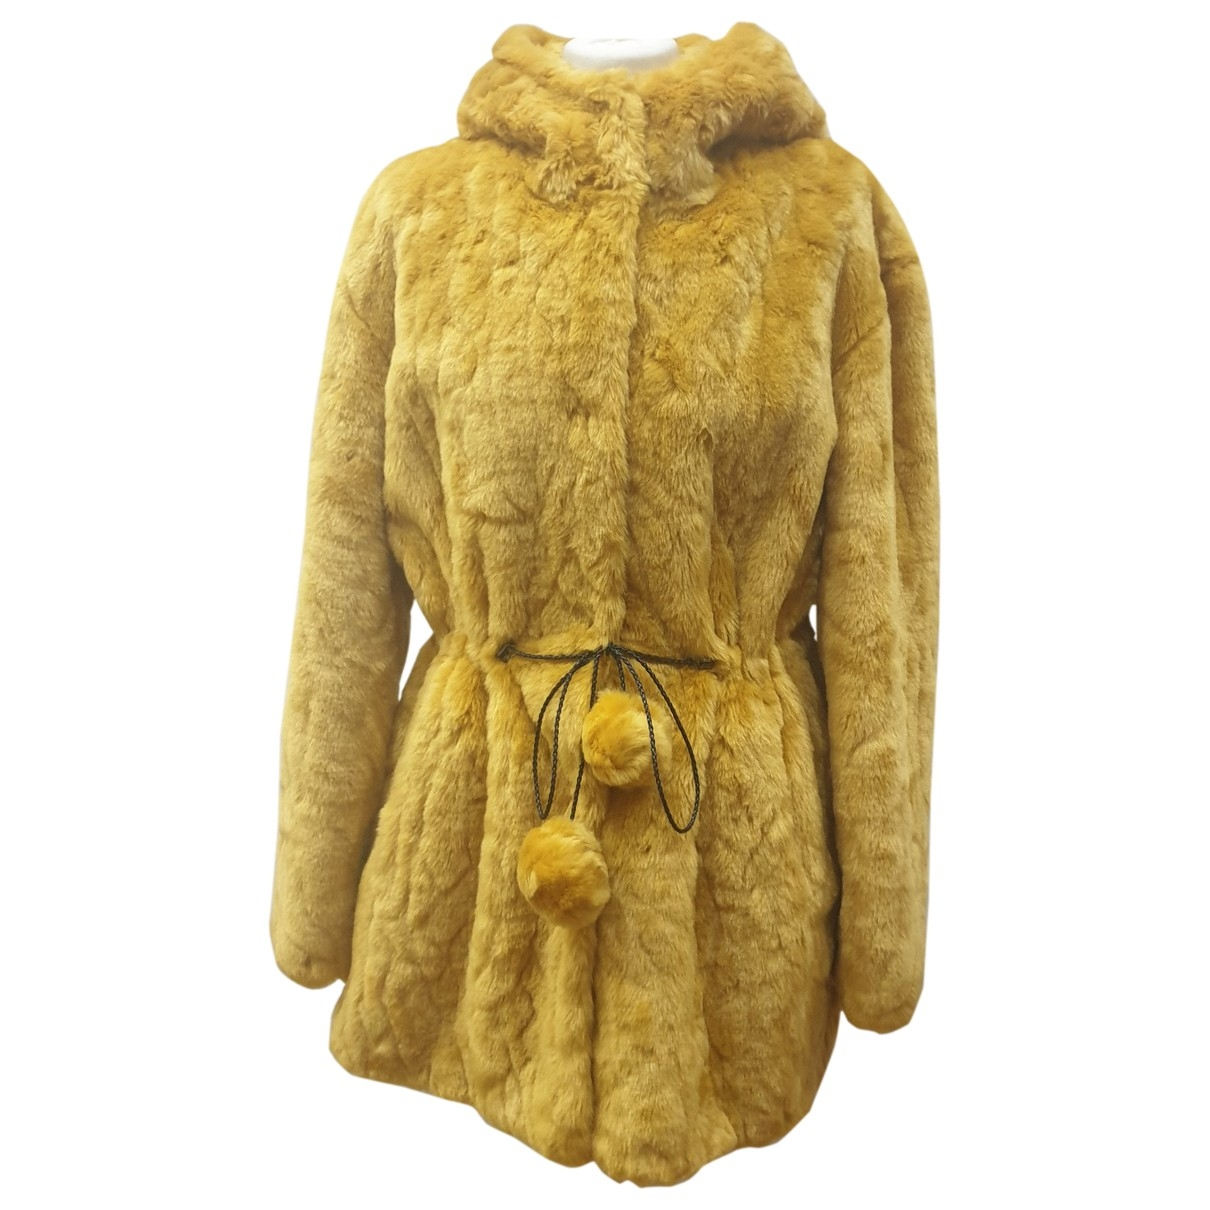 Trussardi Jeans \N Yellow Faux fur coat for Women L International